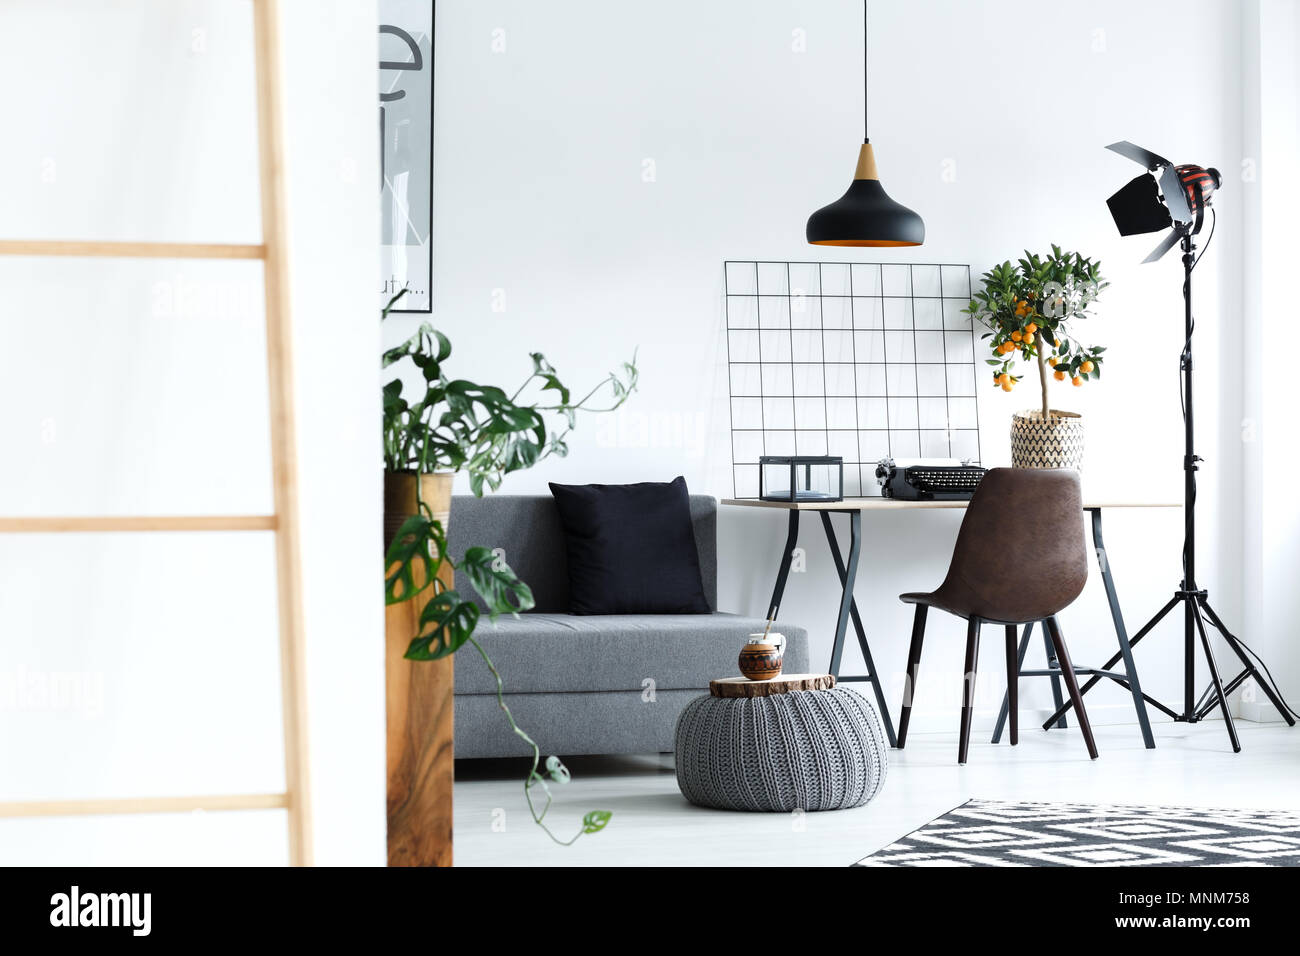 White Minimalist Living Room With Grey Sofa Lamp Desk Ladder